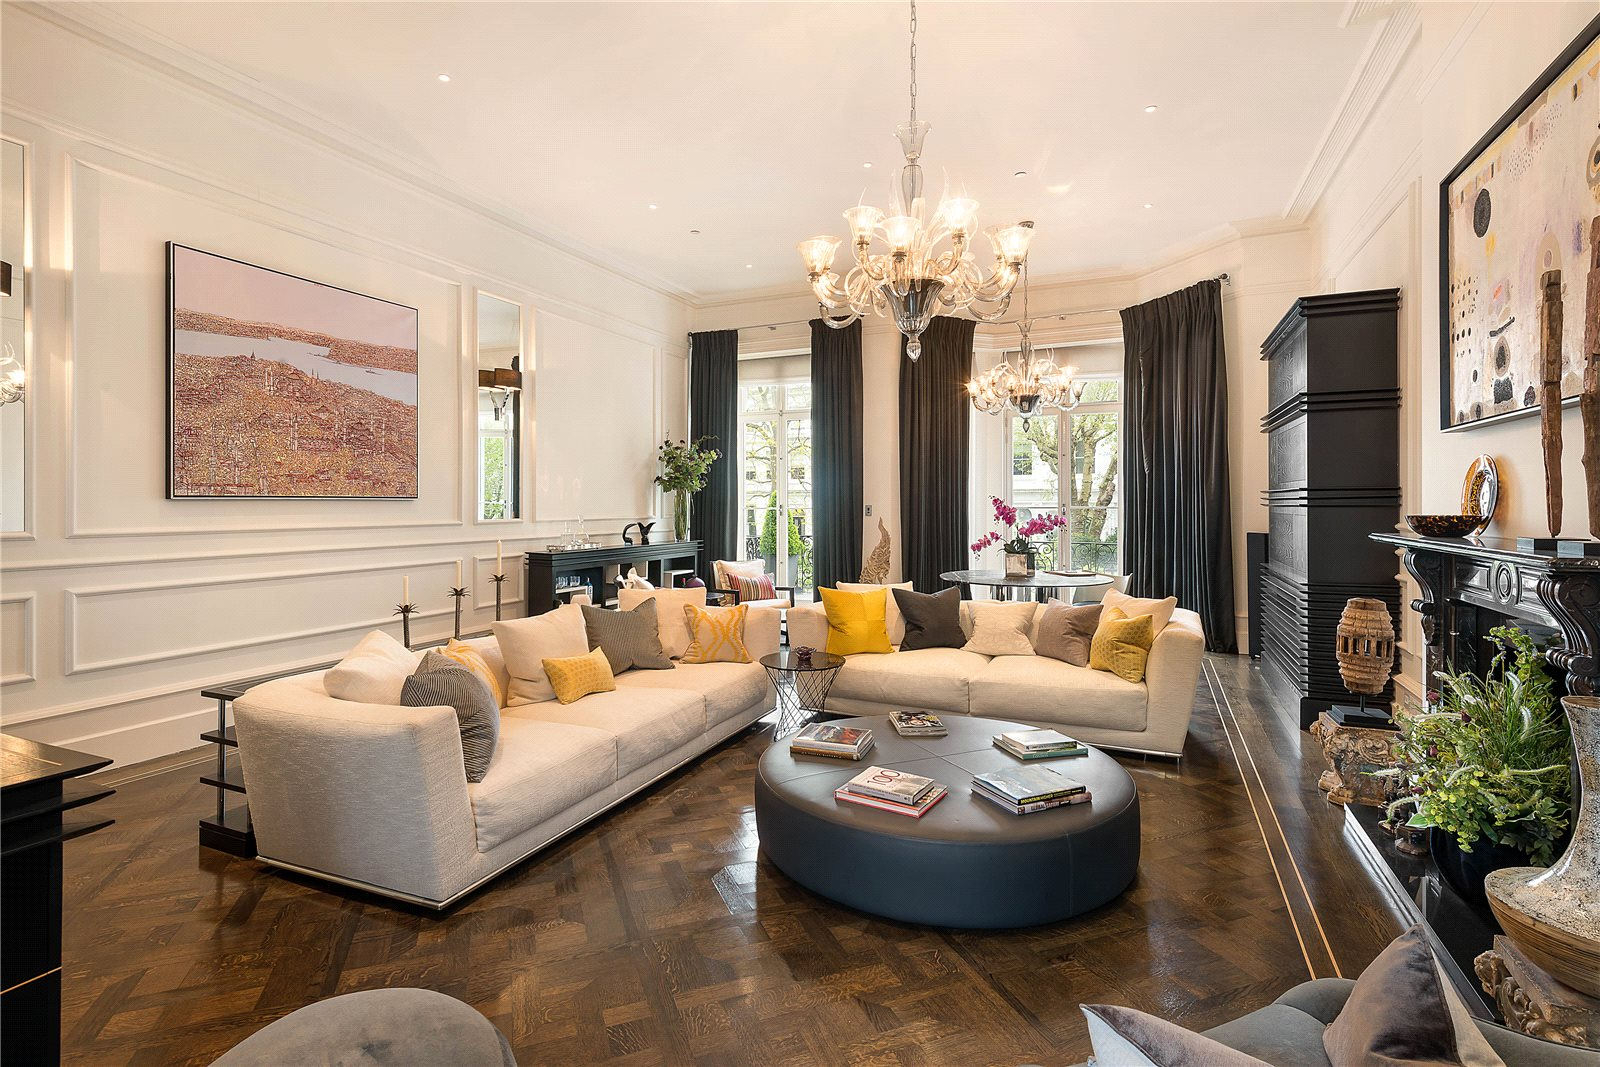 Single Family Home For Sale At Vicarage Gate, Kensington, London, W8  Kensington,